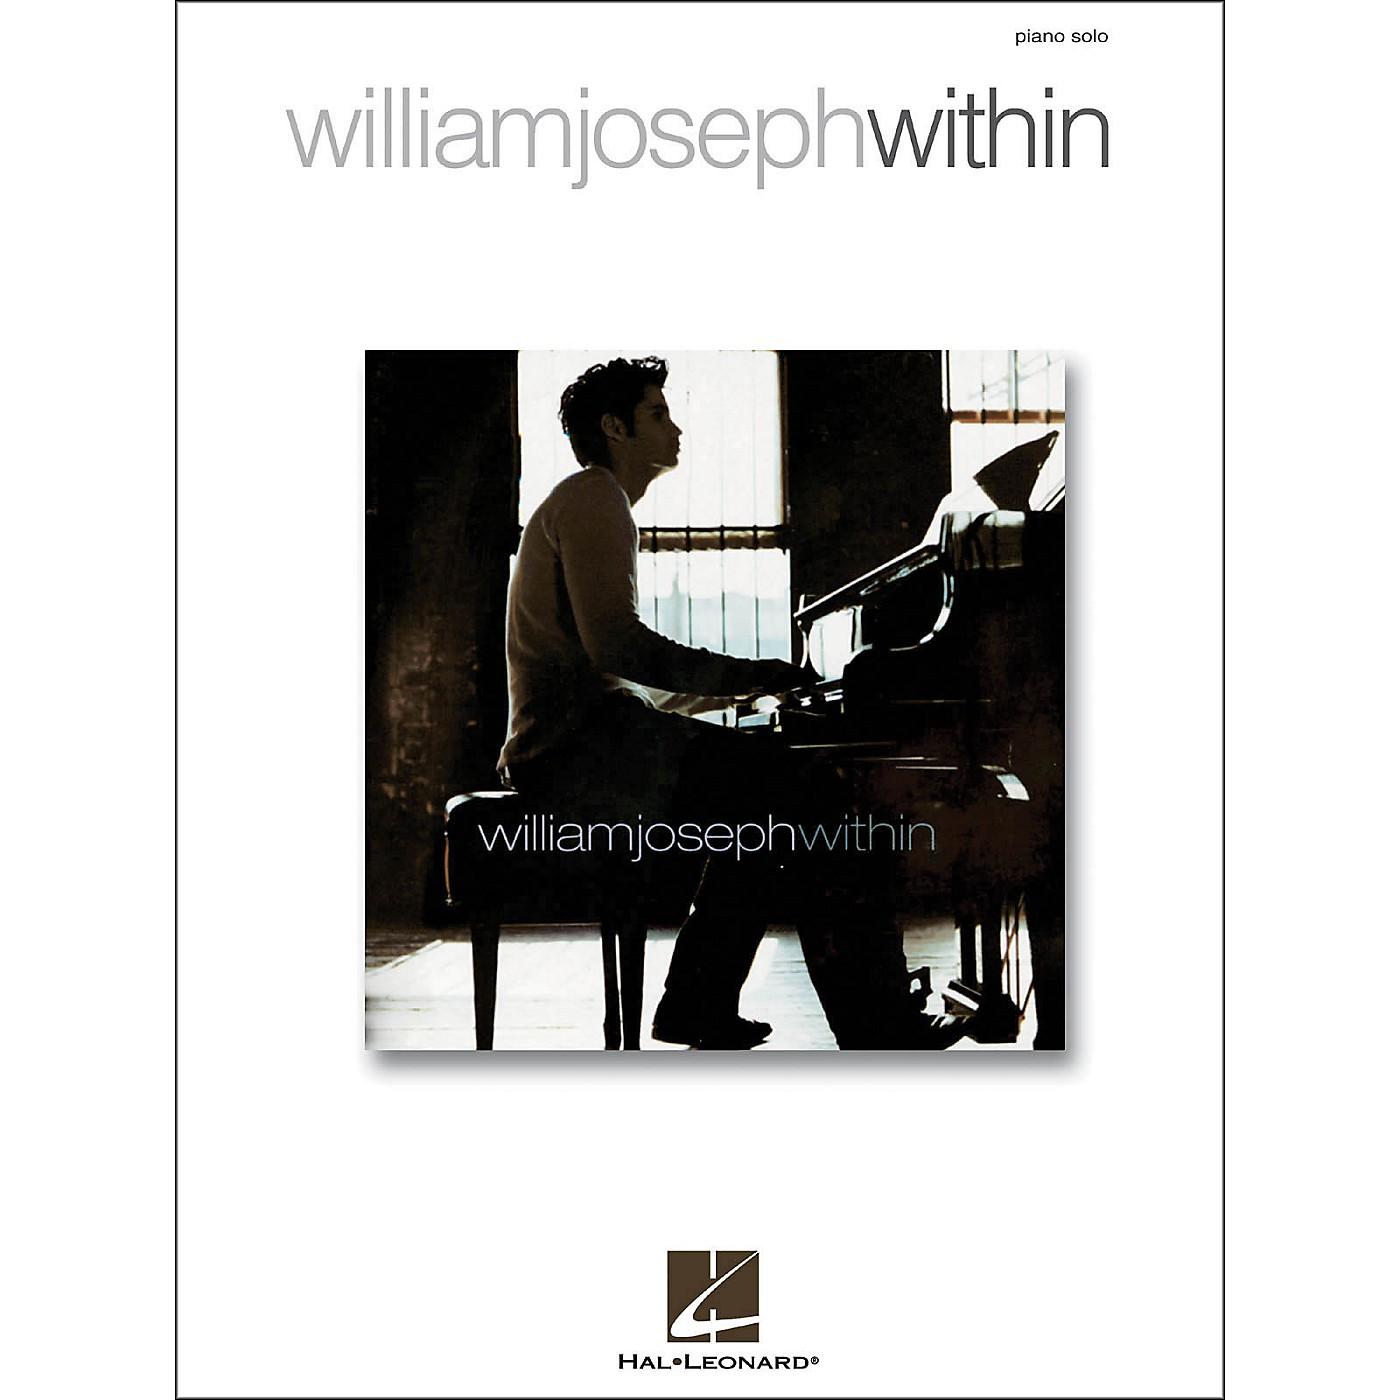 Hal Leonard William Joseph - within for Piano Solo thumbnail